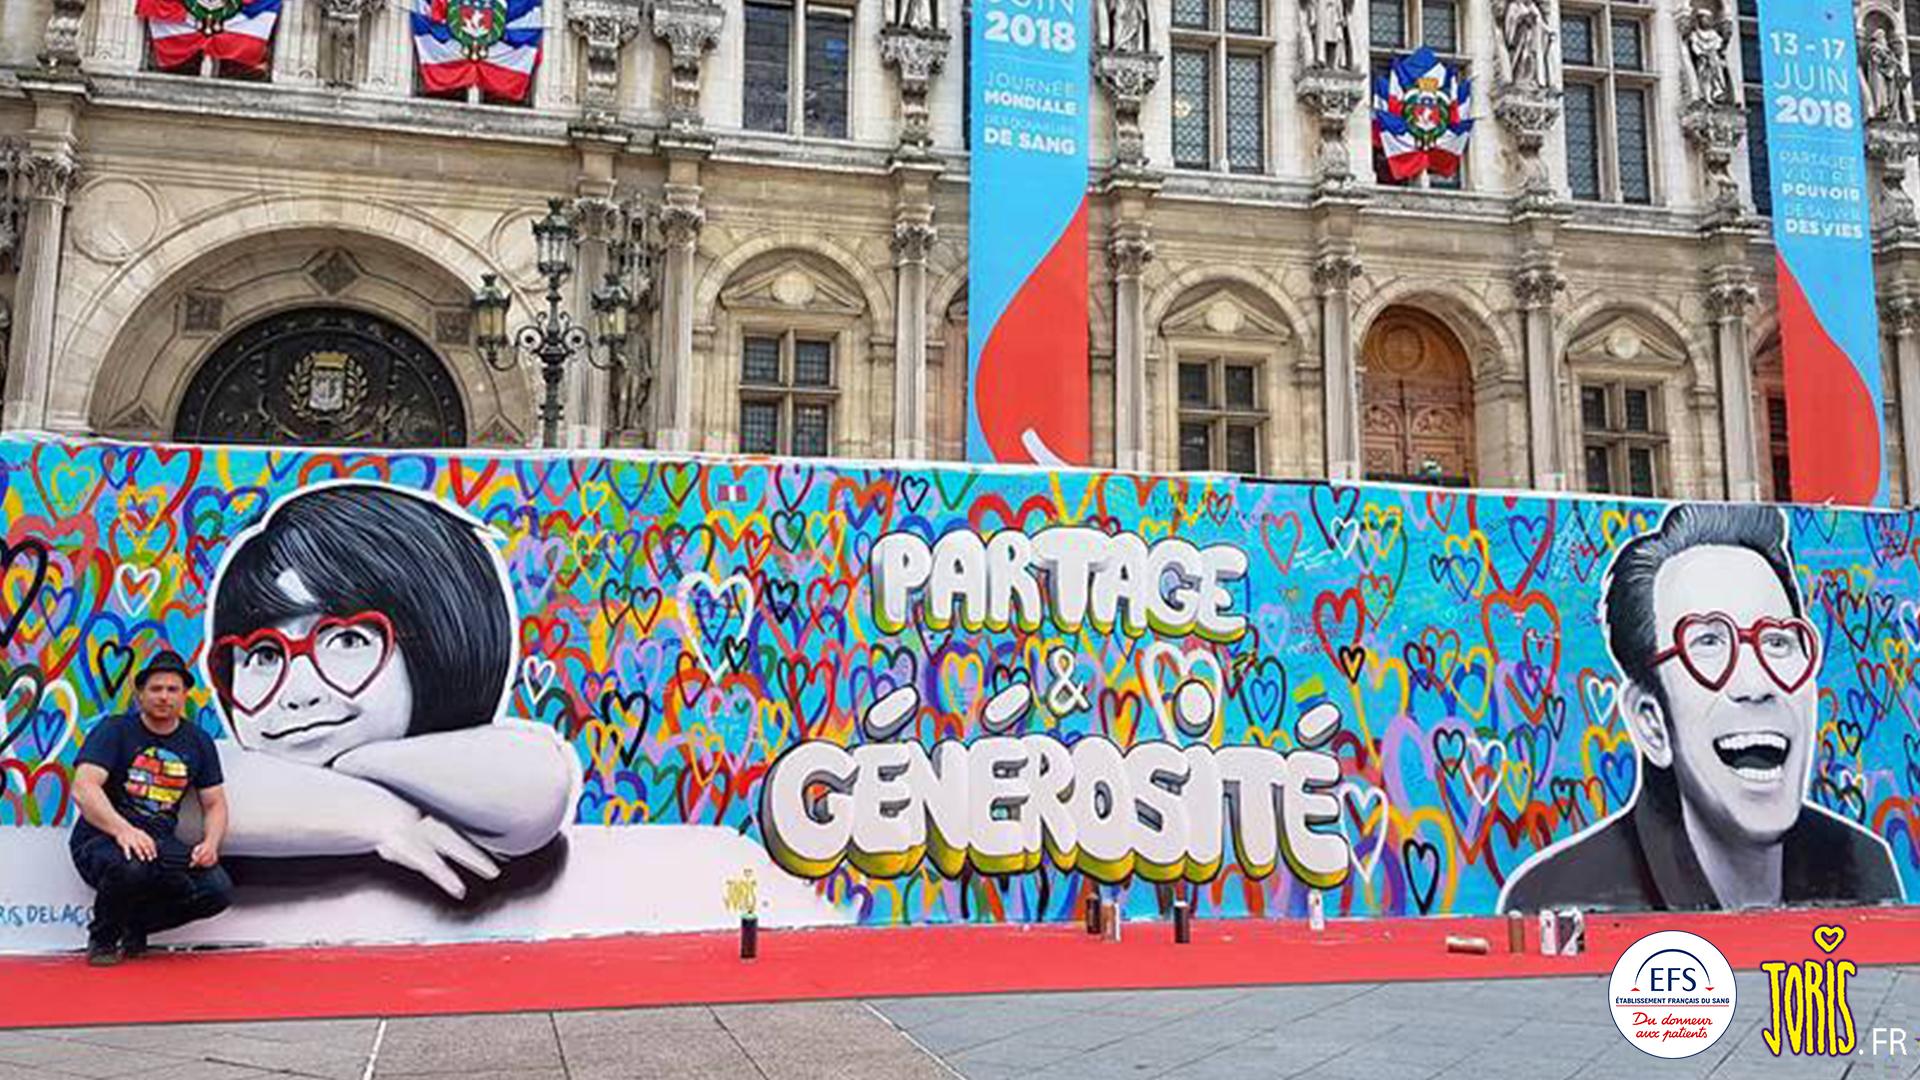 DECORATION-GRAFFITI-FRESQUE-TABLEAU-STREET-ART-PARIS-12